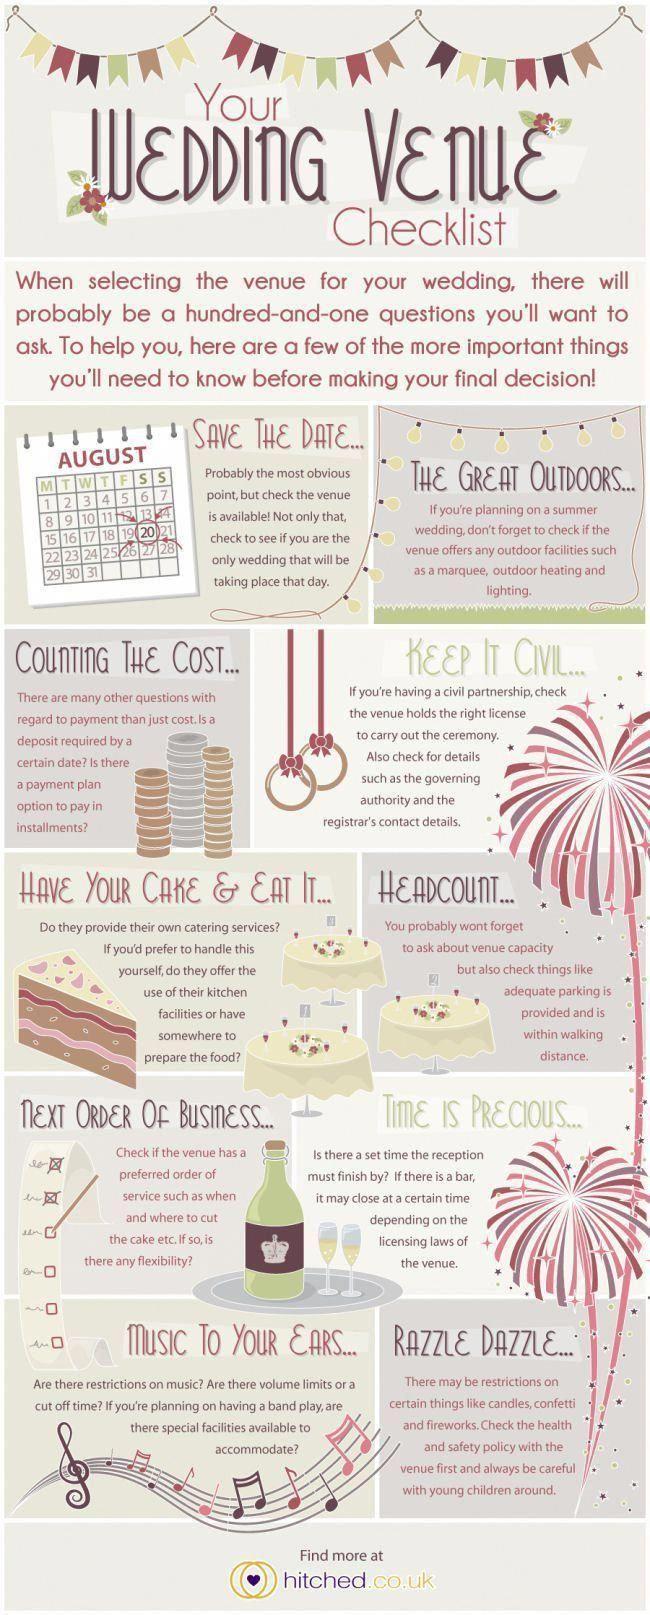 Psychology-Infographic-Your-Wedding-Venue-Checklist-Infographic-weddingchecklist Psychology Infographic : Your Wedding Venue Checklist Infographic #weddingchecklist